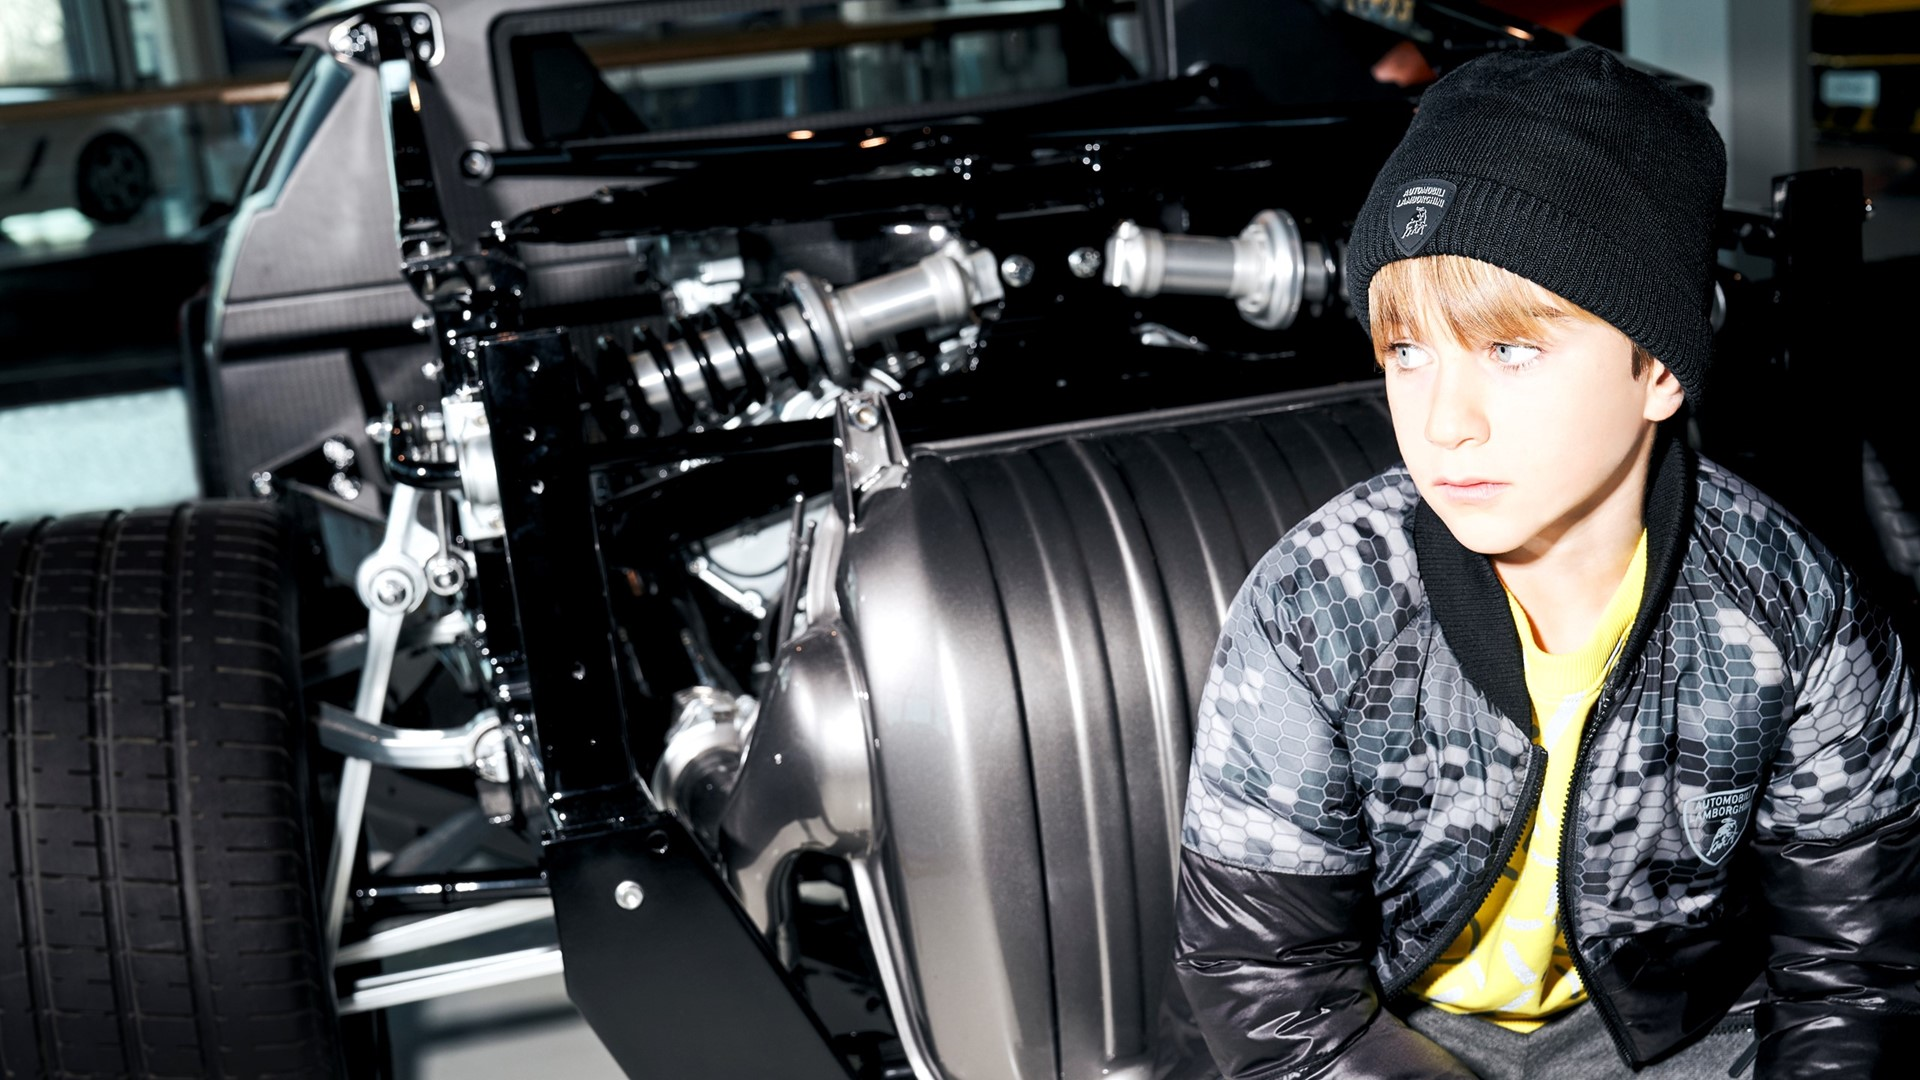 Automobili Lamborghini and KABOOKI confirm kidswear licensing agreement - Image 4